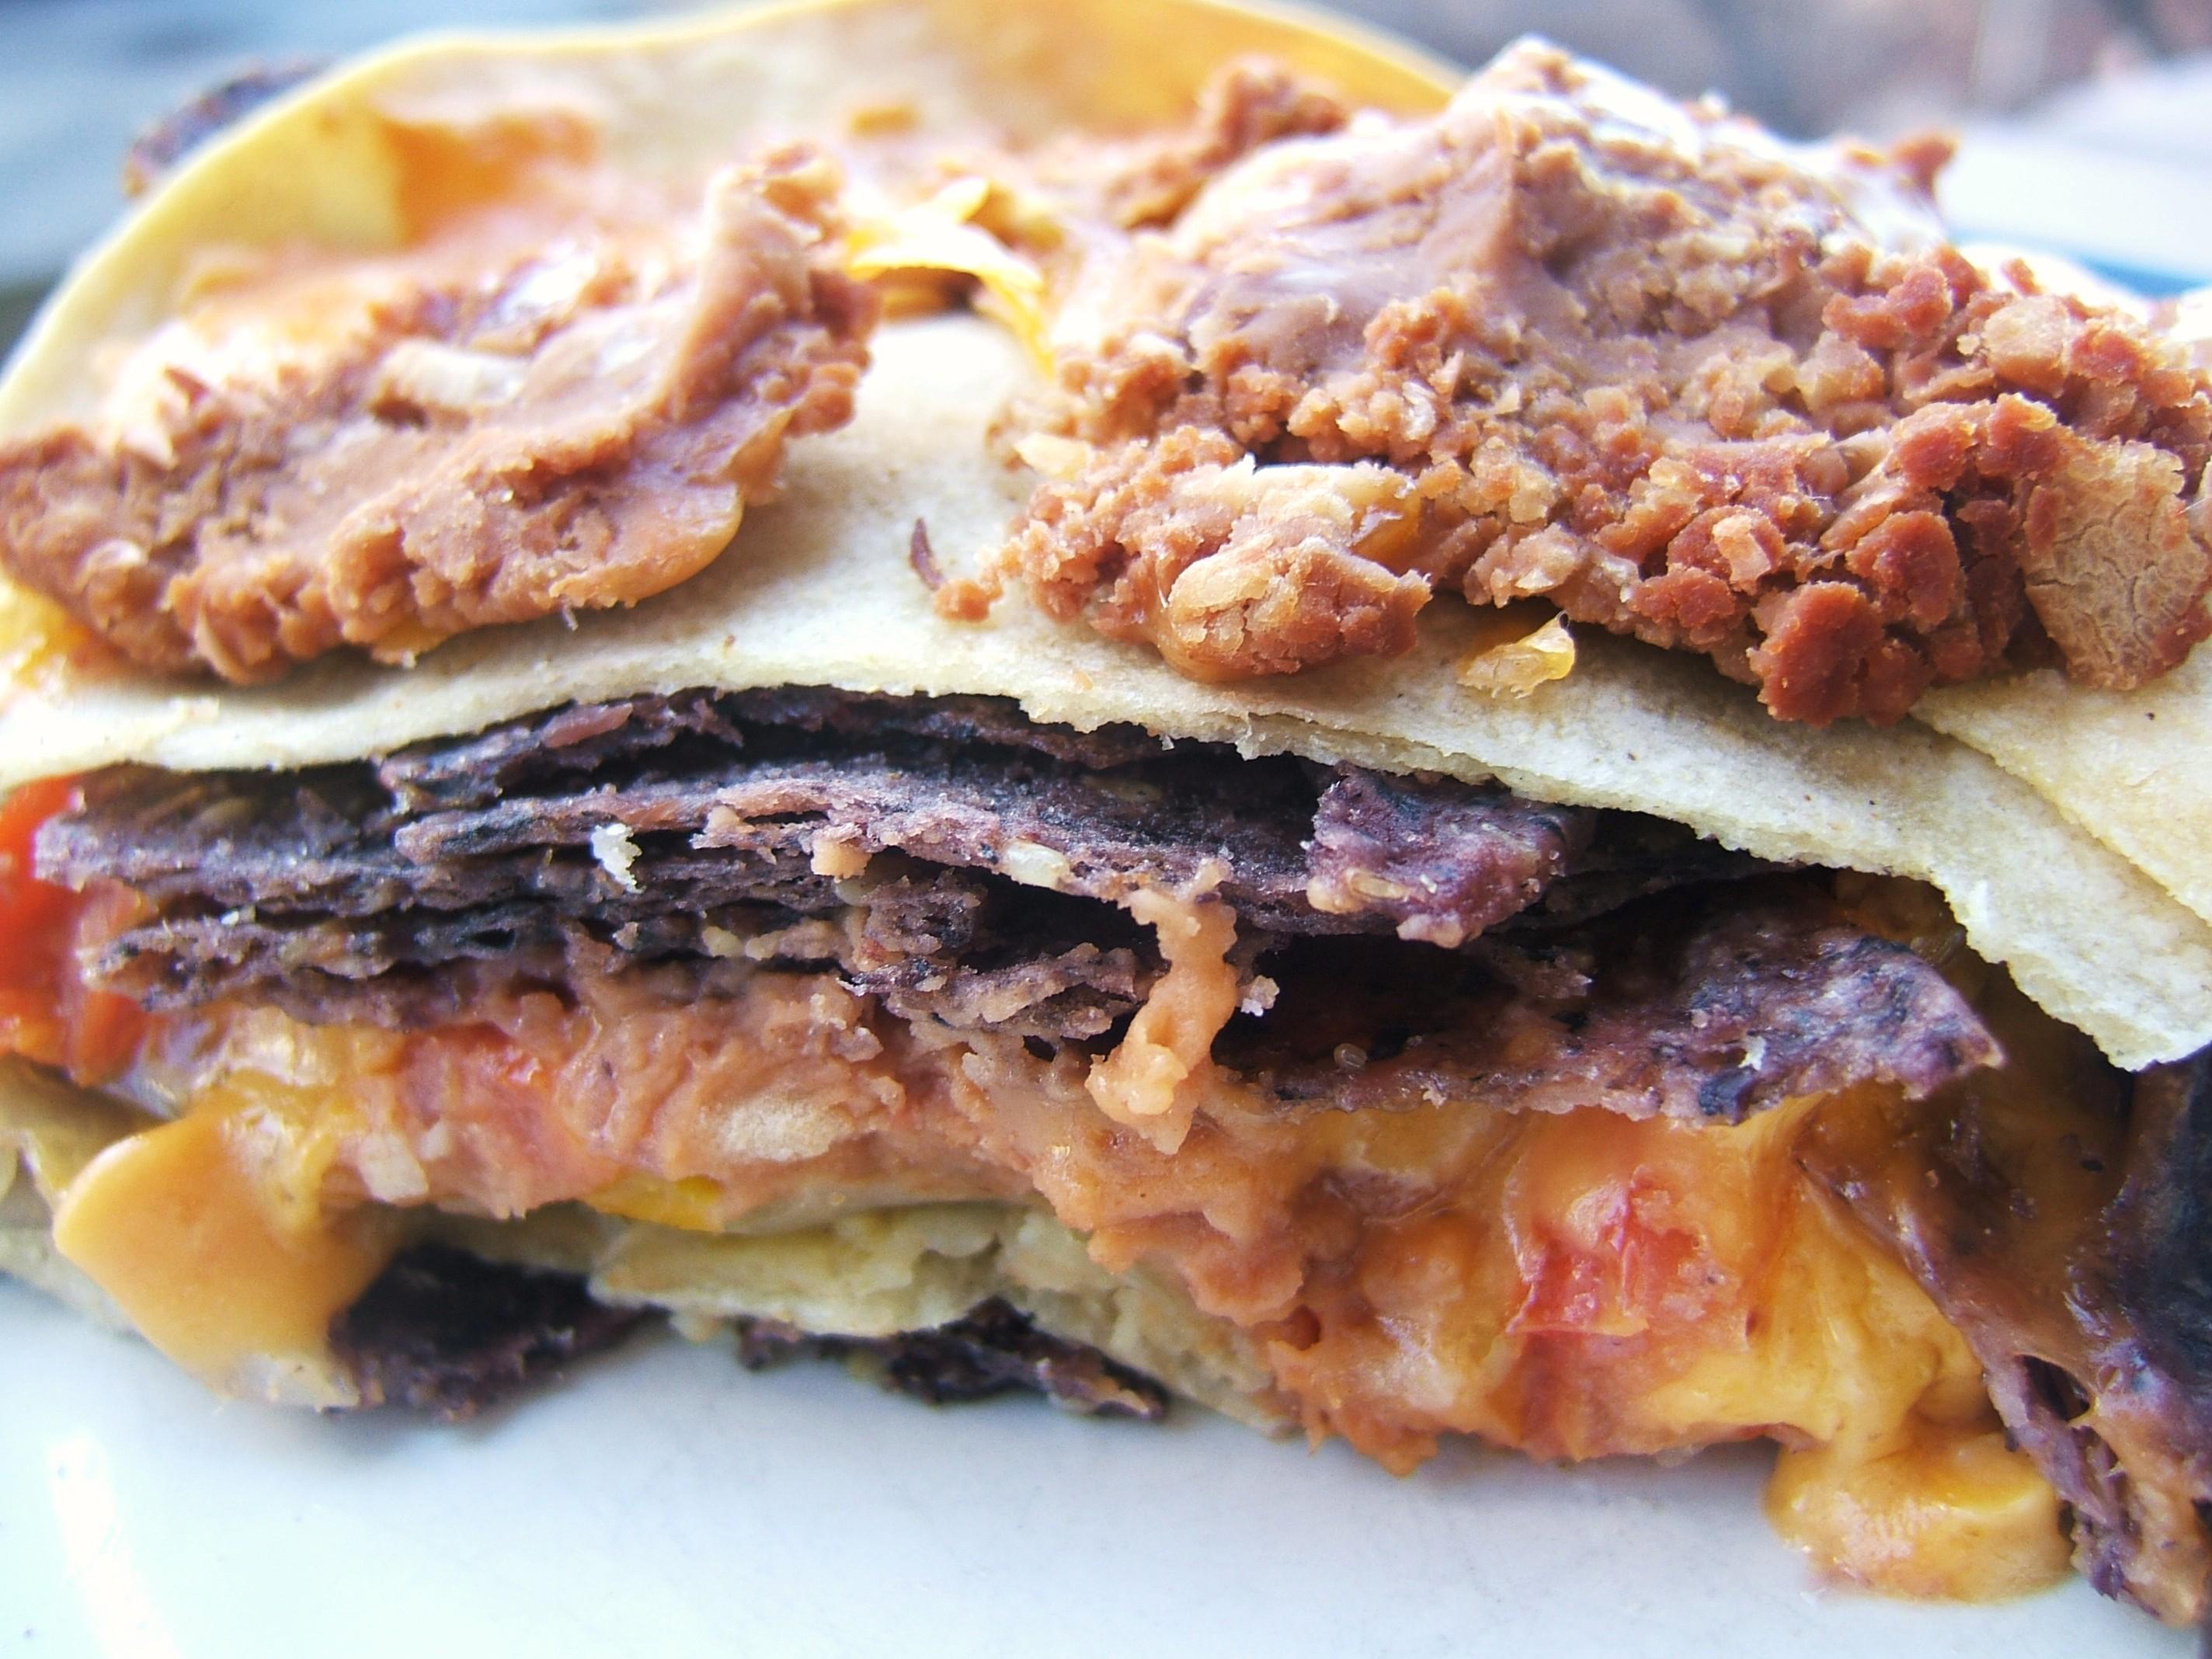 2012-02-18-VegetarianMexicanLasagna.jpg